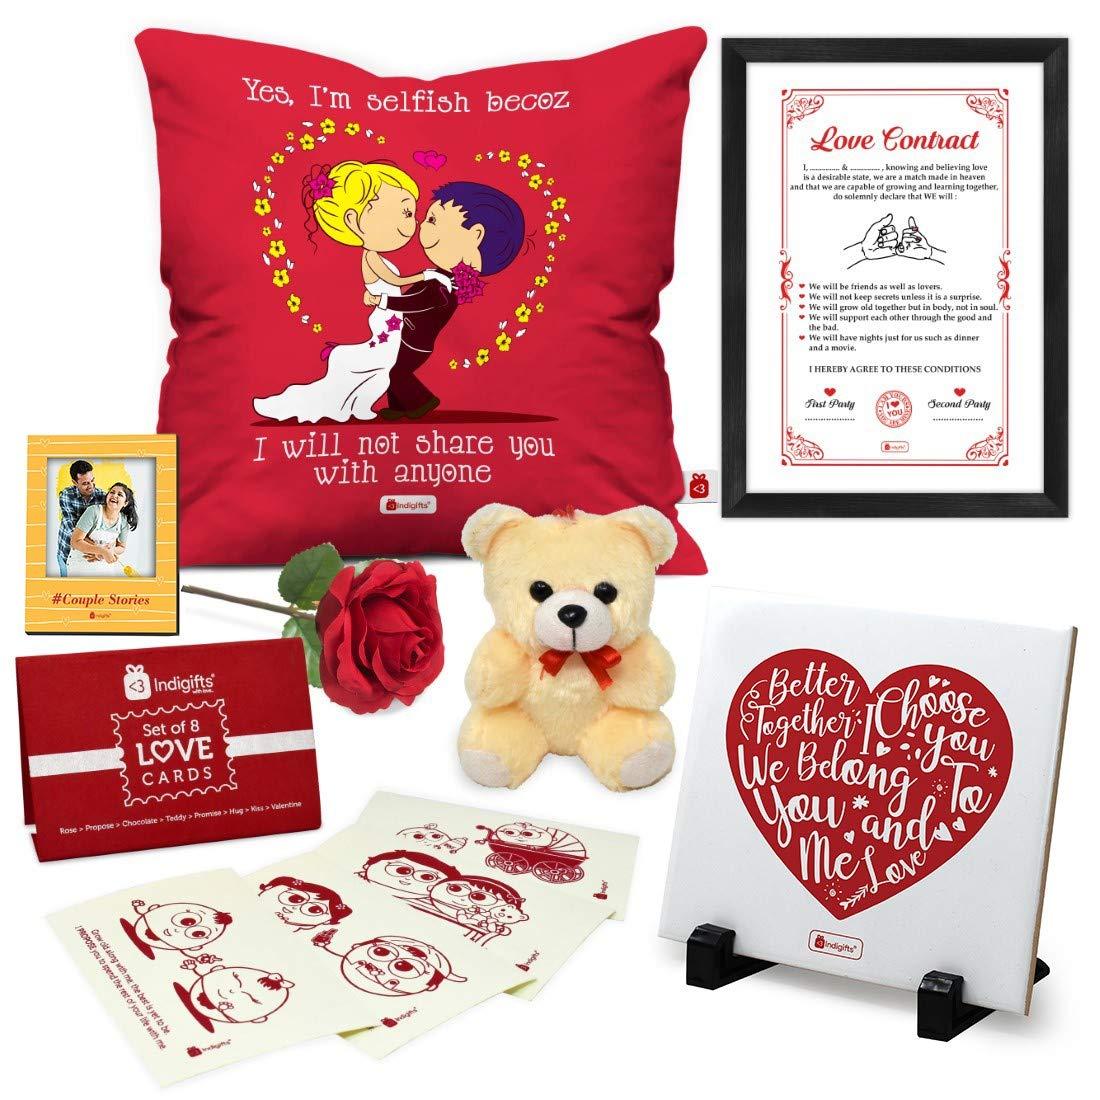 Best Valentine Day Gift Under 500 Rs, 200 Rs